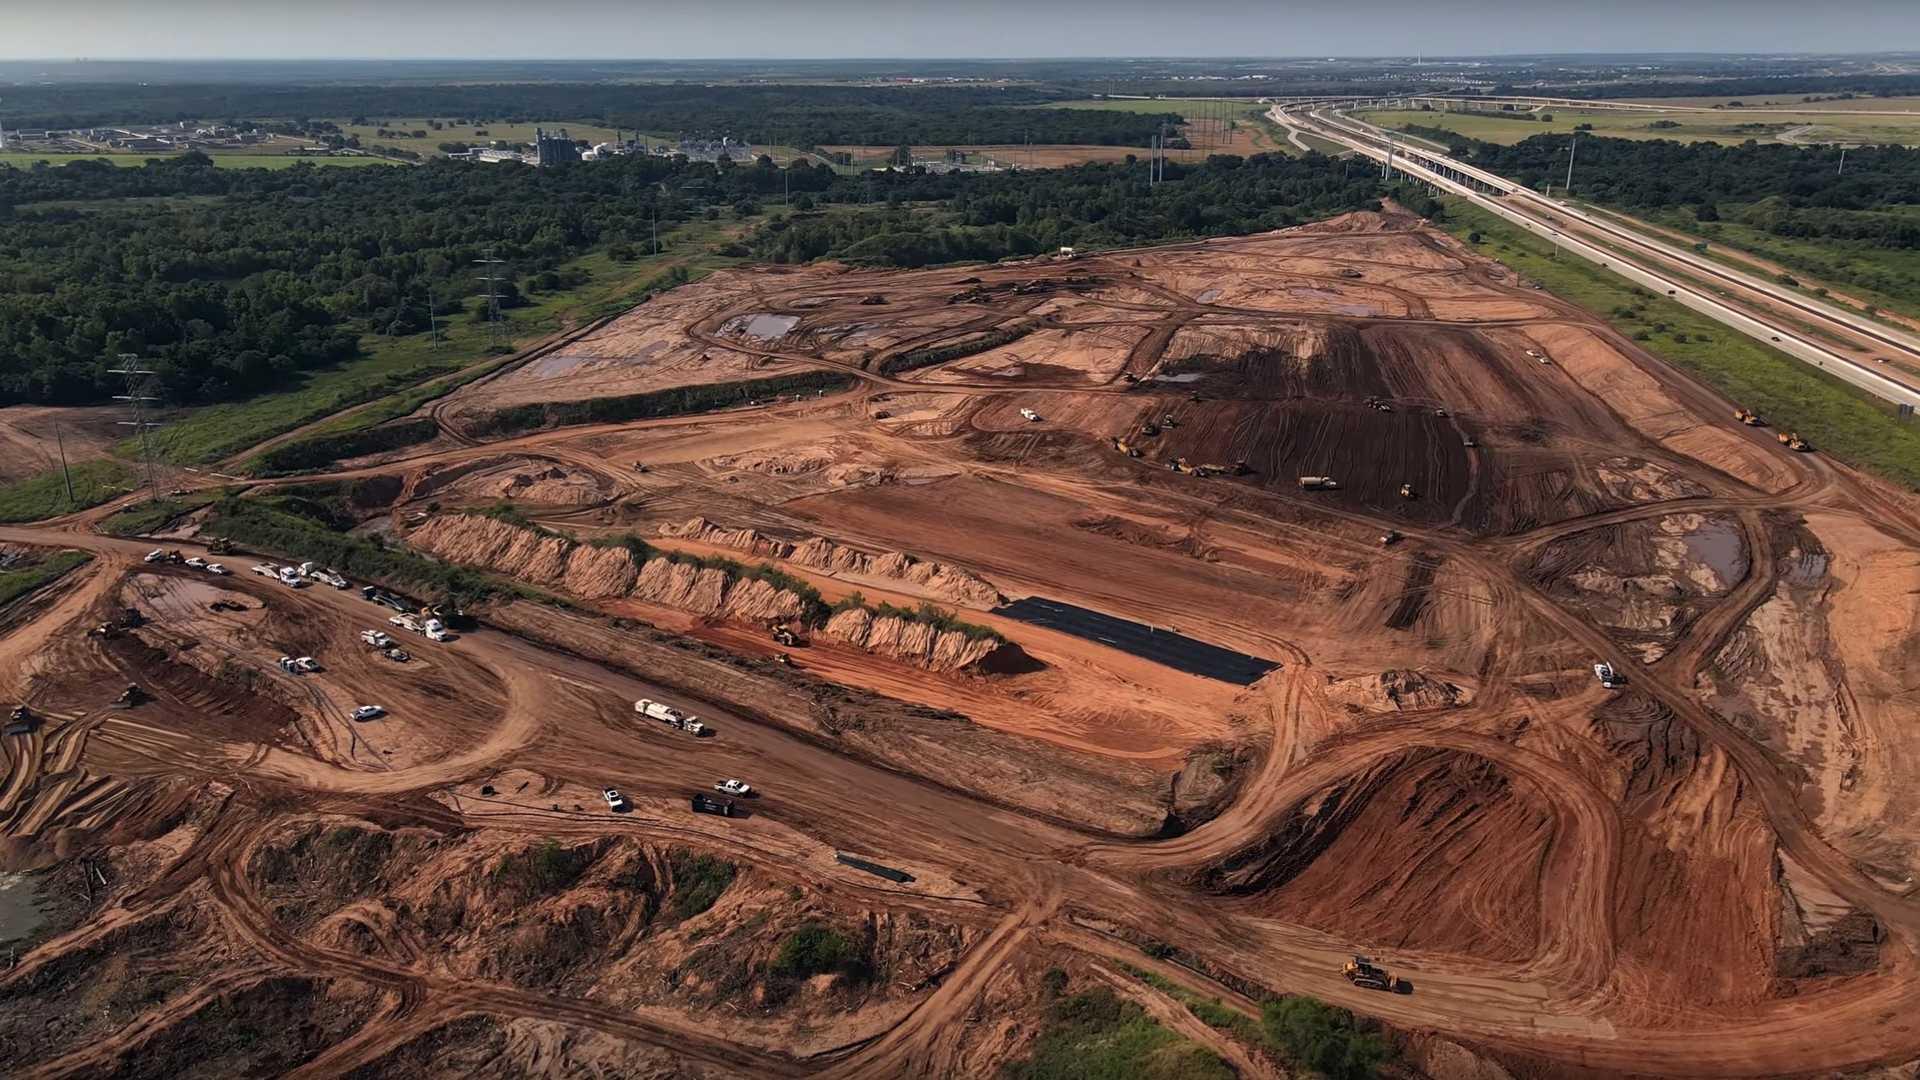 Tesla Cybertruck Giga Austin Land Cost Tesla Less Than $100 Million